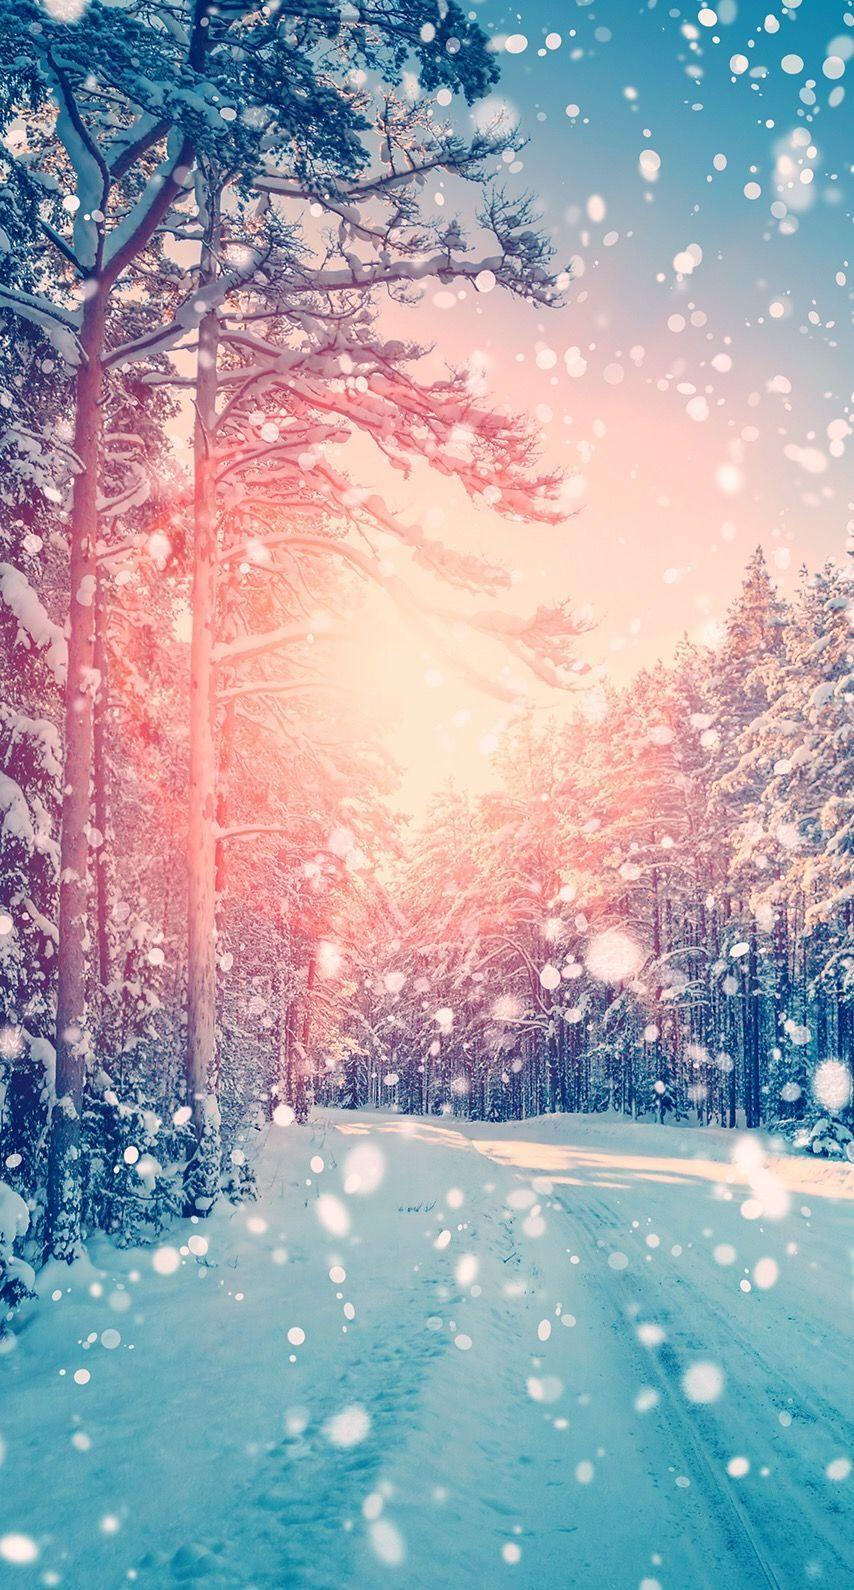 Simple Cute Winter Wallpapers - Wallpaper Cave